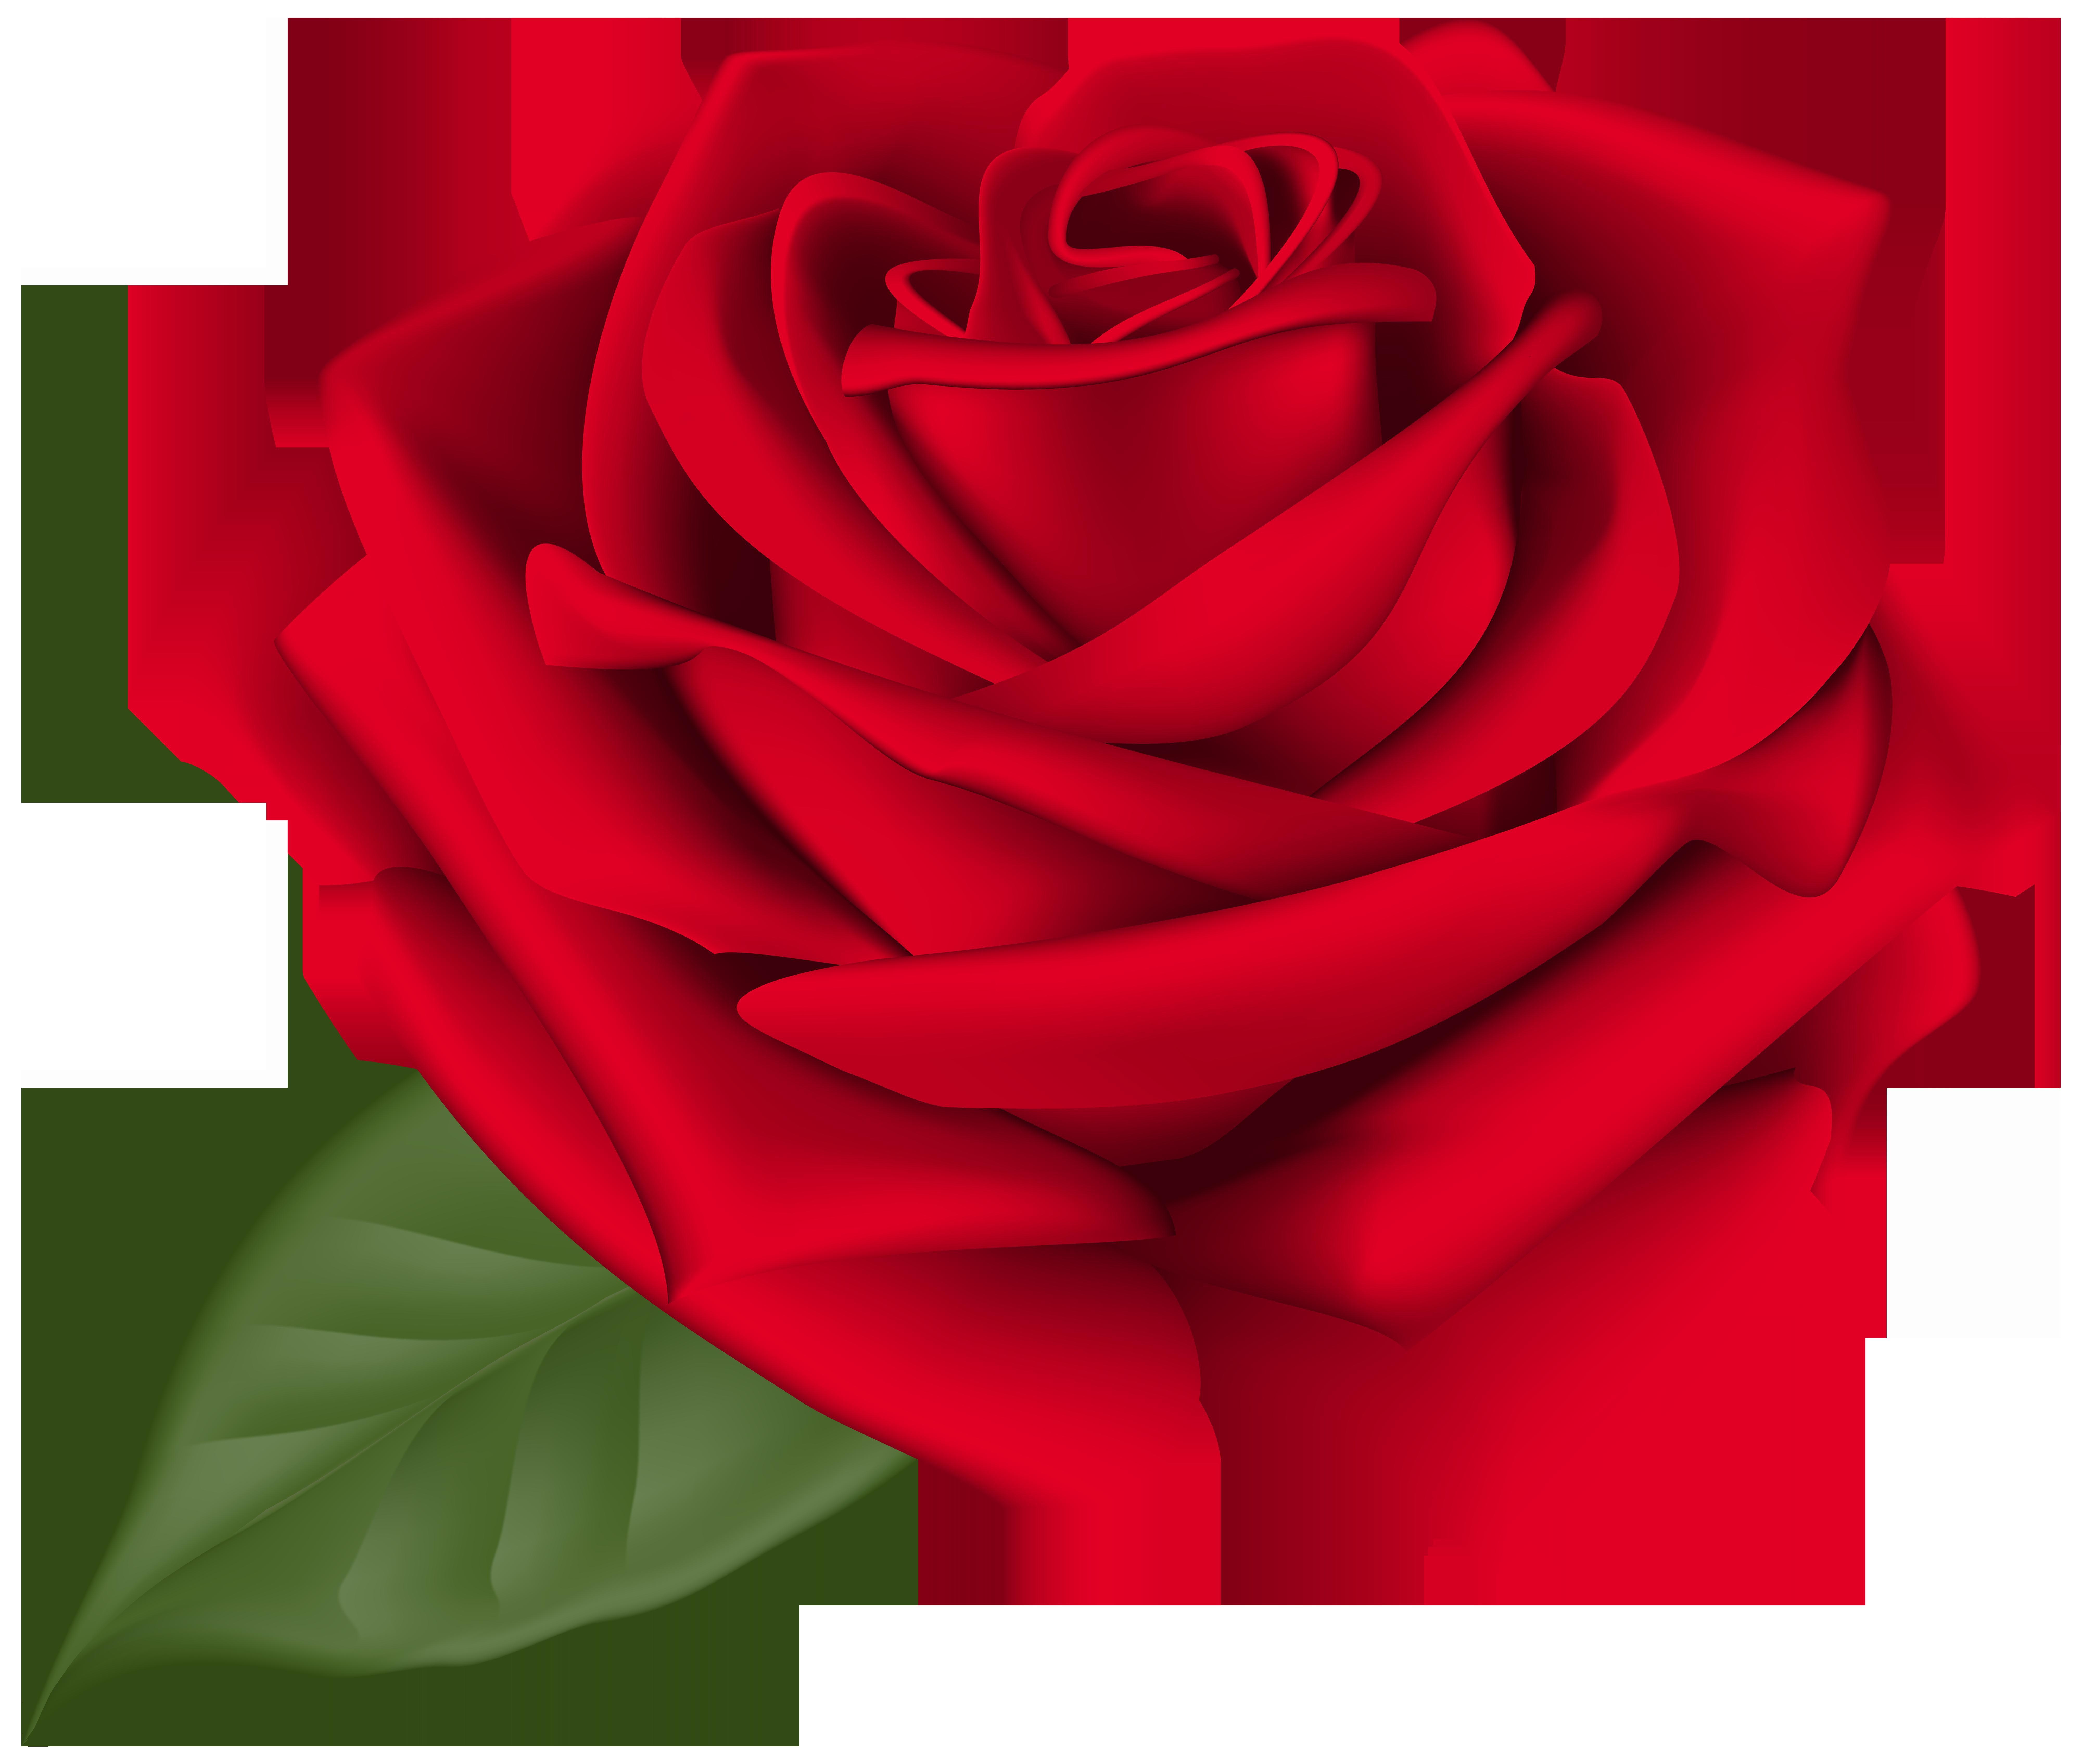 Red flower clipart no background image transparent stock Rose Red Transparent PNG Clip Art Image | Gallery Yopriceville ... image transparent stock